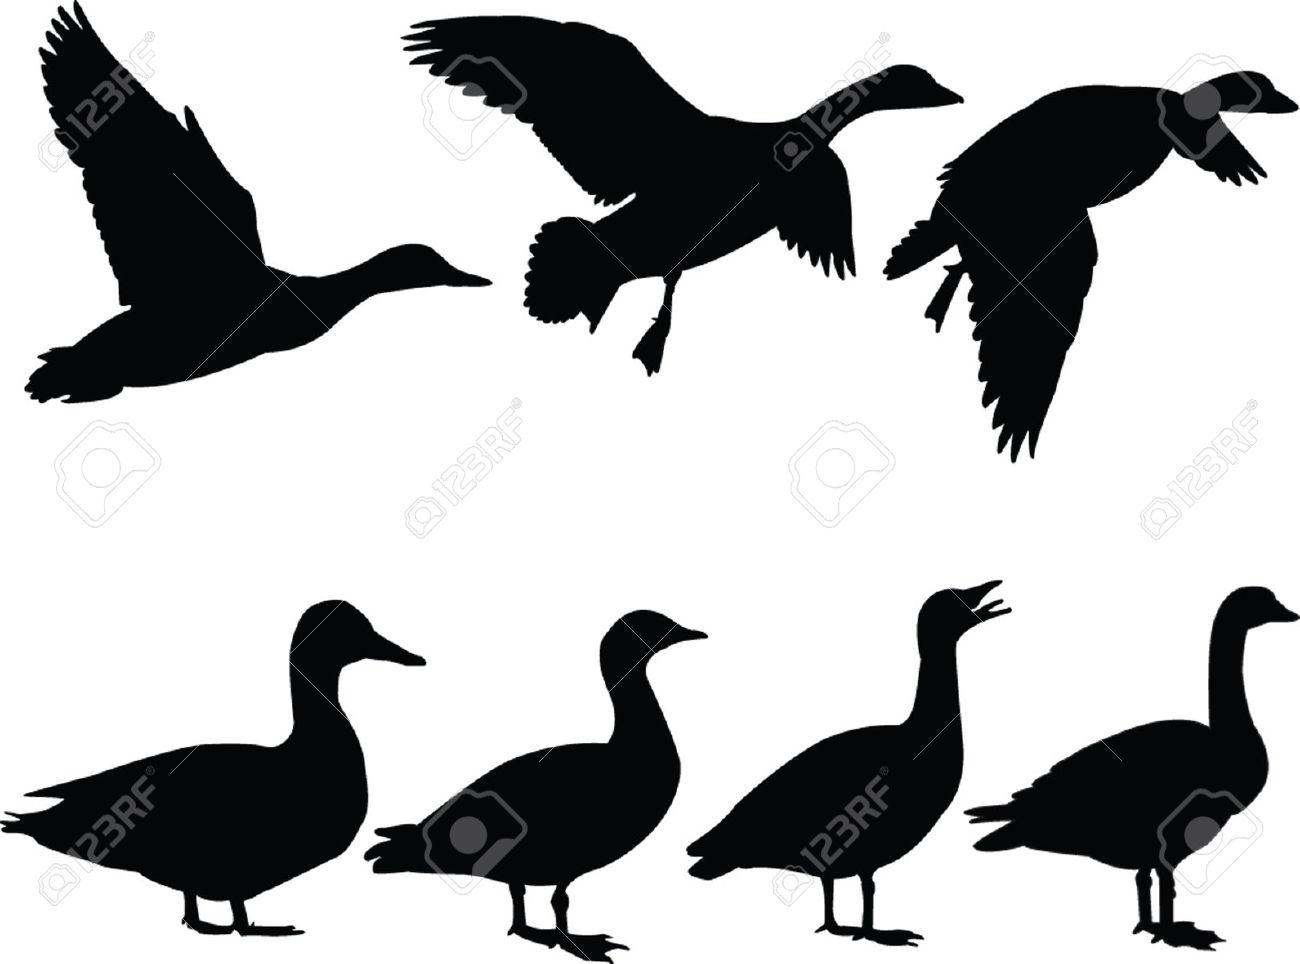 Duck Silhouette Clipart.